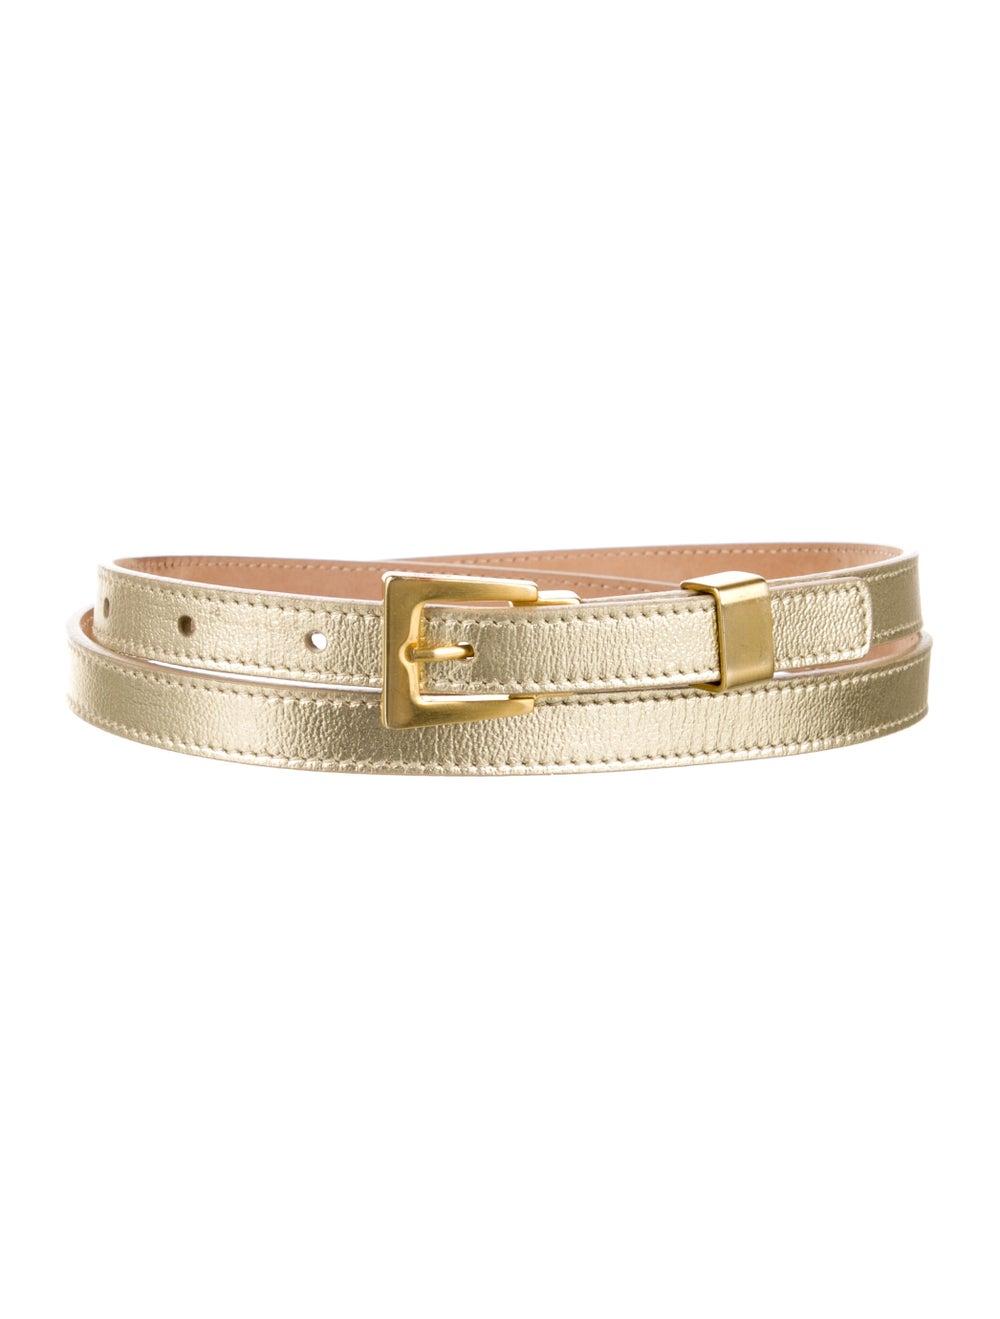 Michael Kors Skinny Leather Belt Gold - image 1